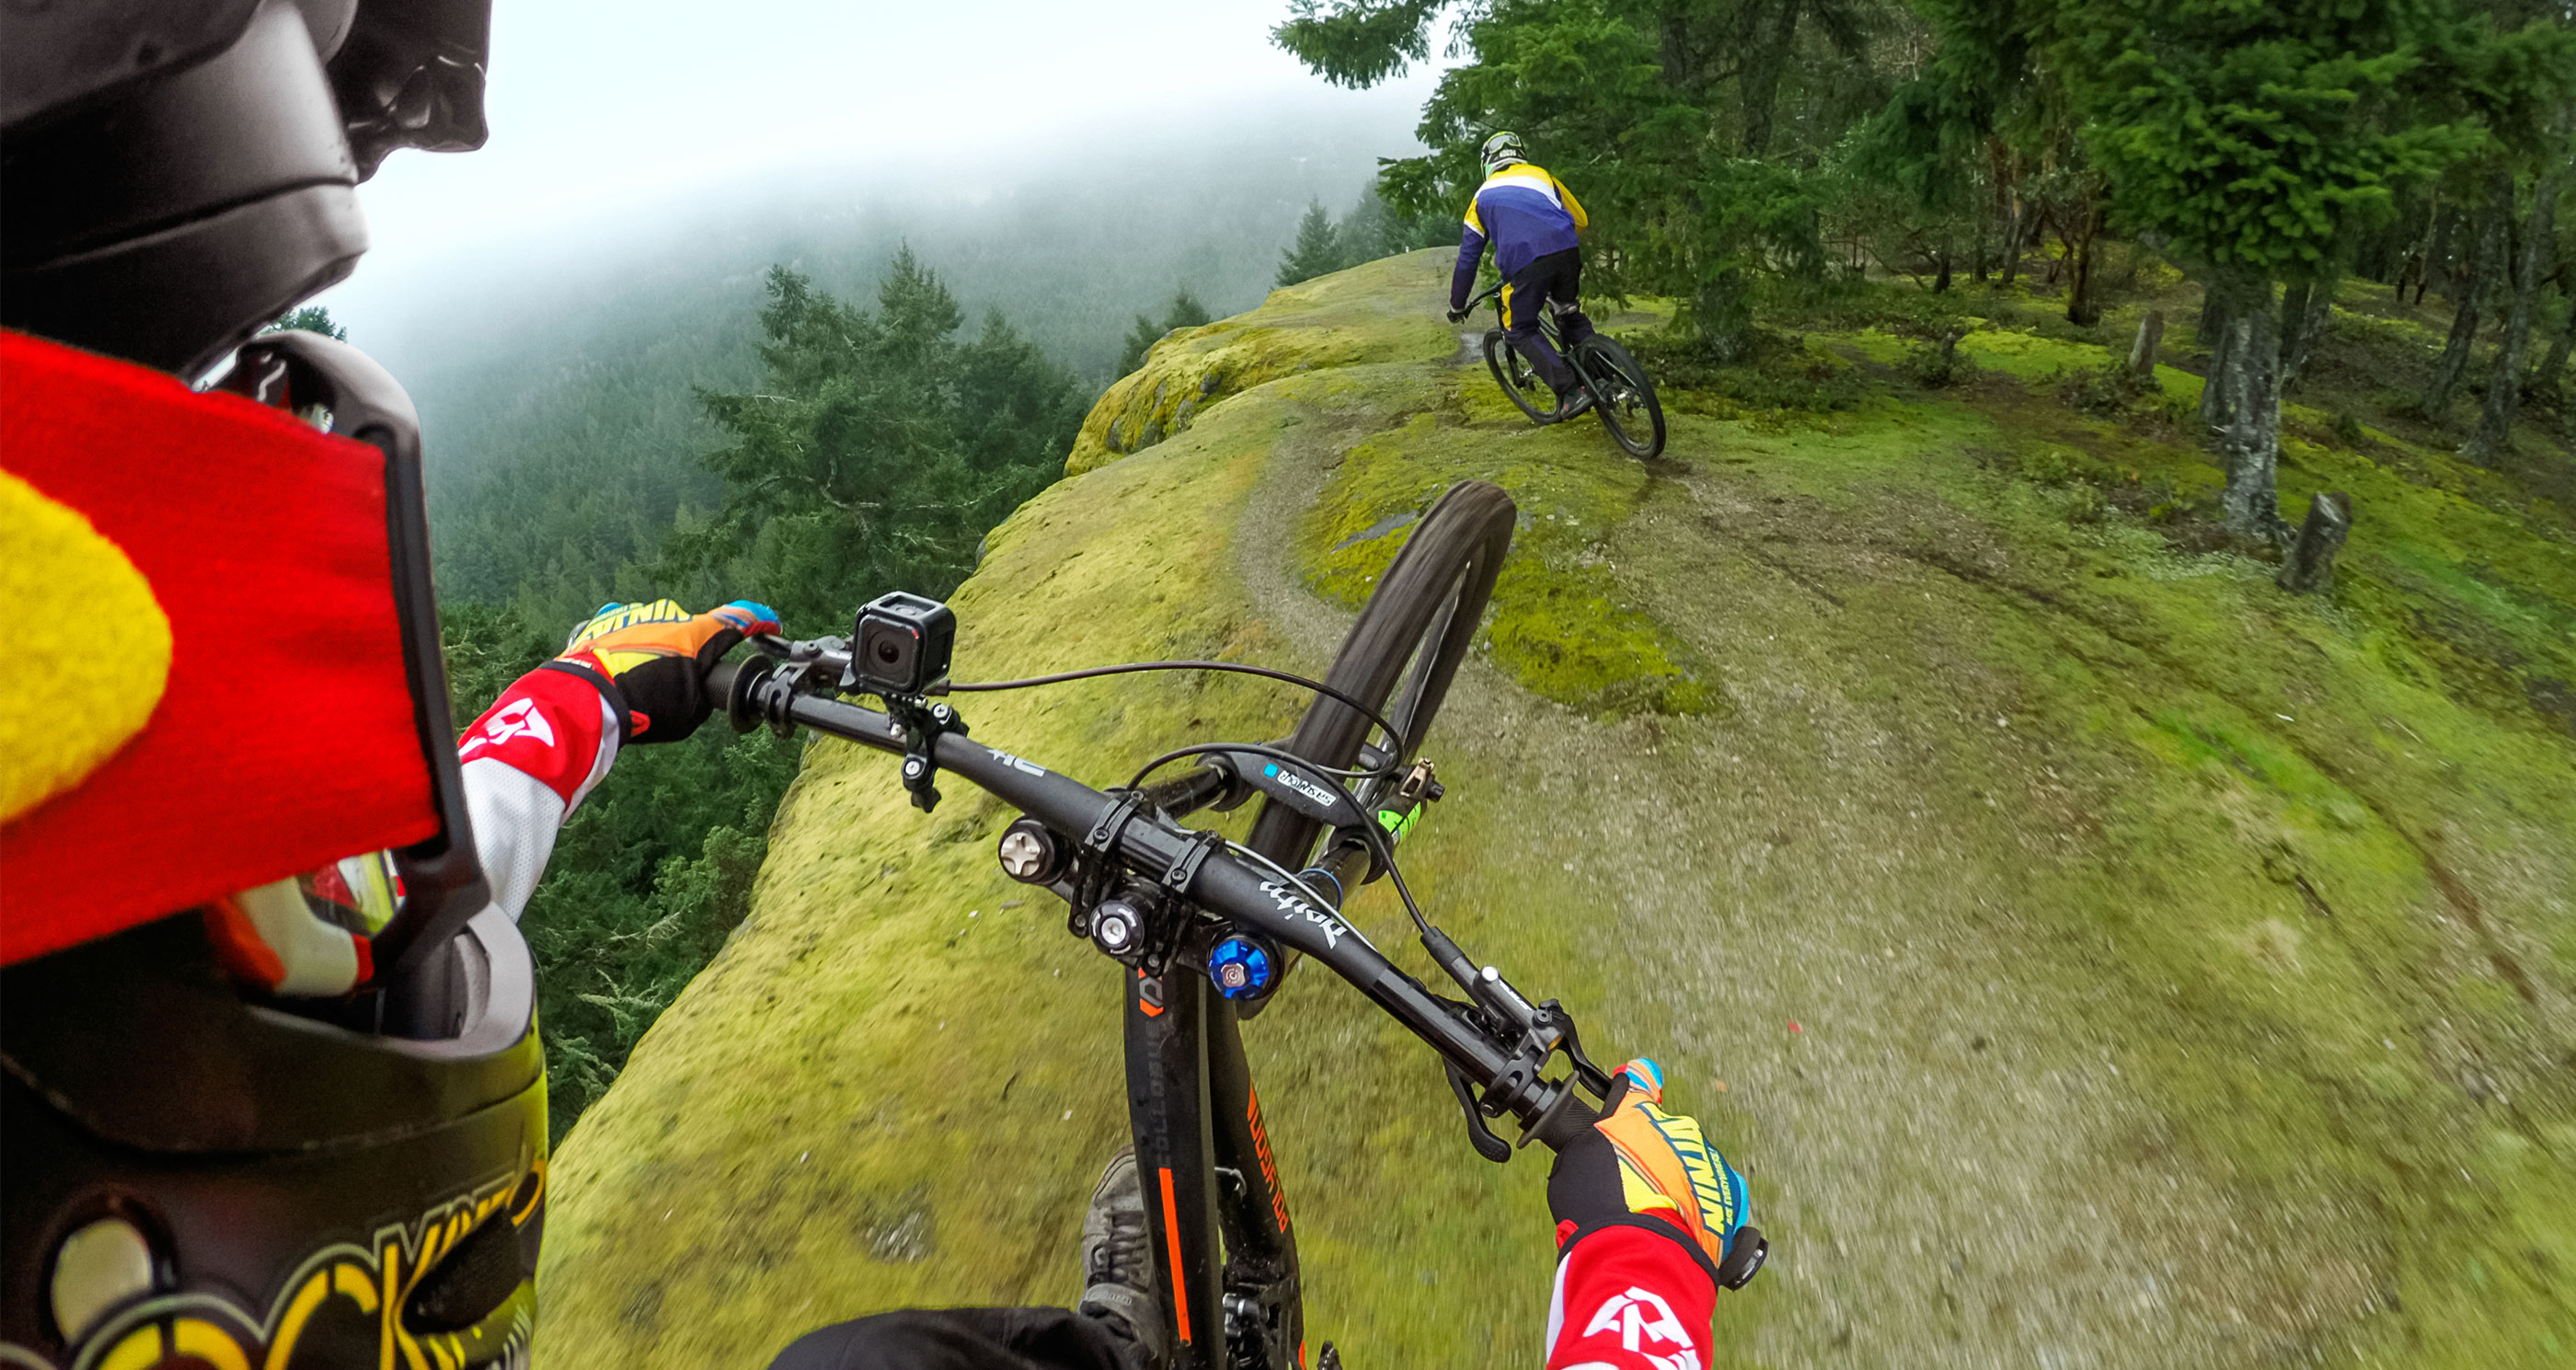 GoPro Hero4 Session bike